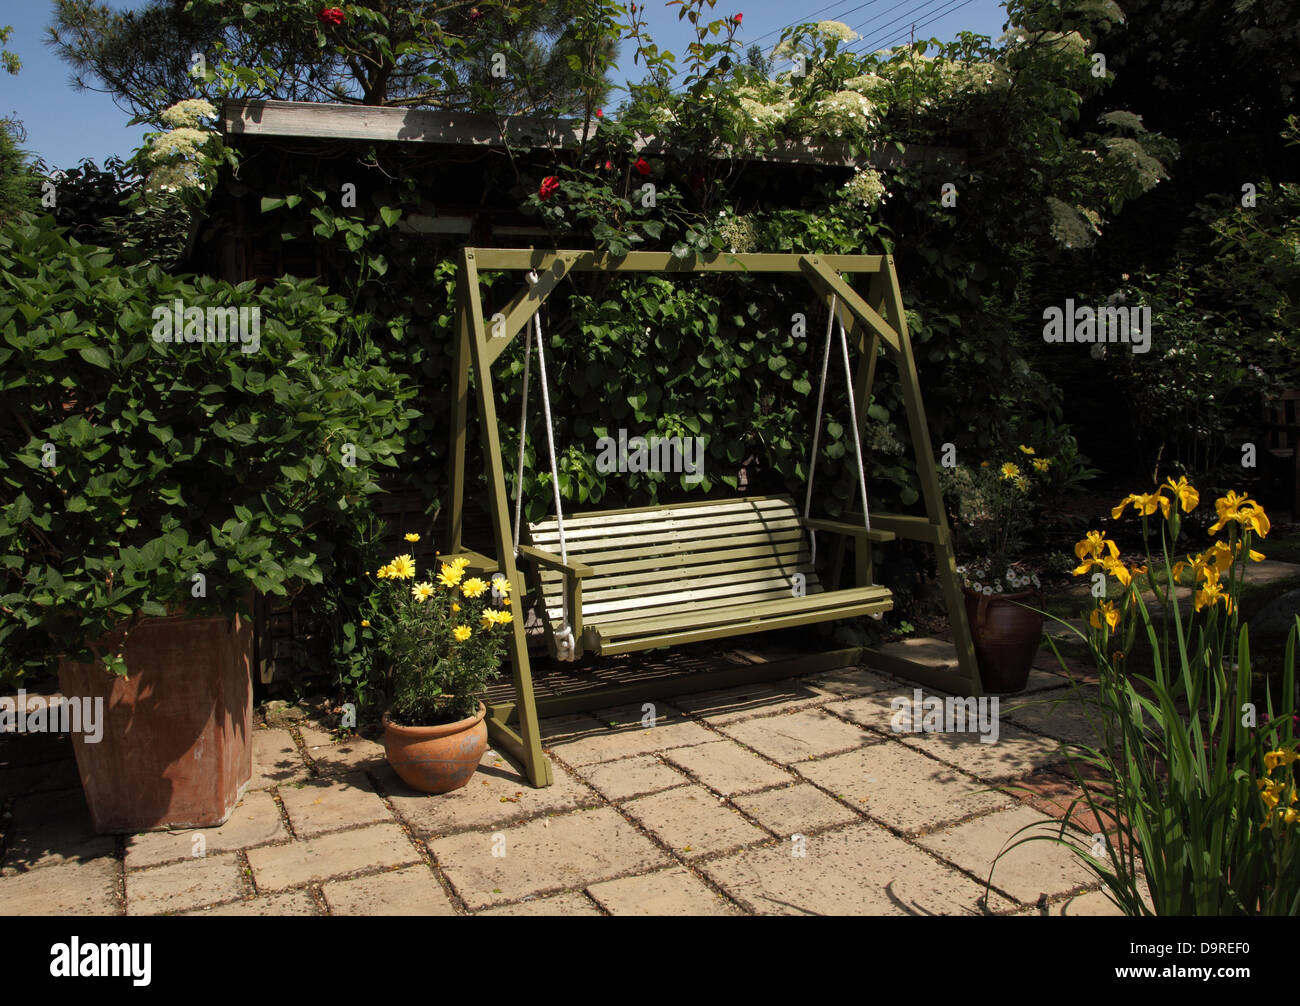 garden swing seat stock photos u0026 garden swing seat stock images